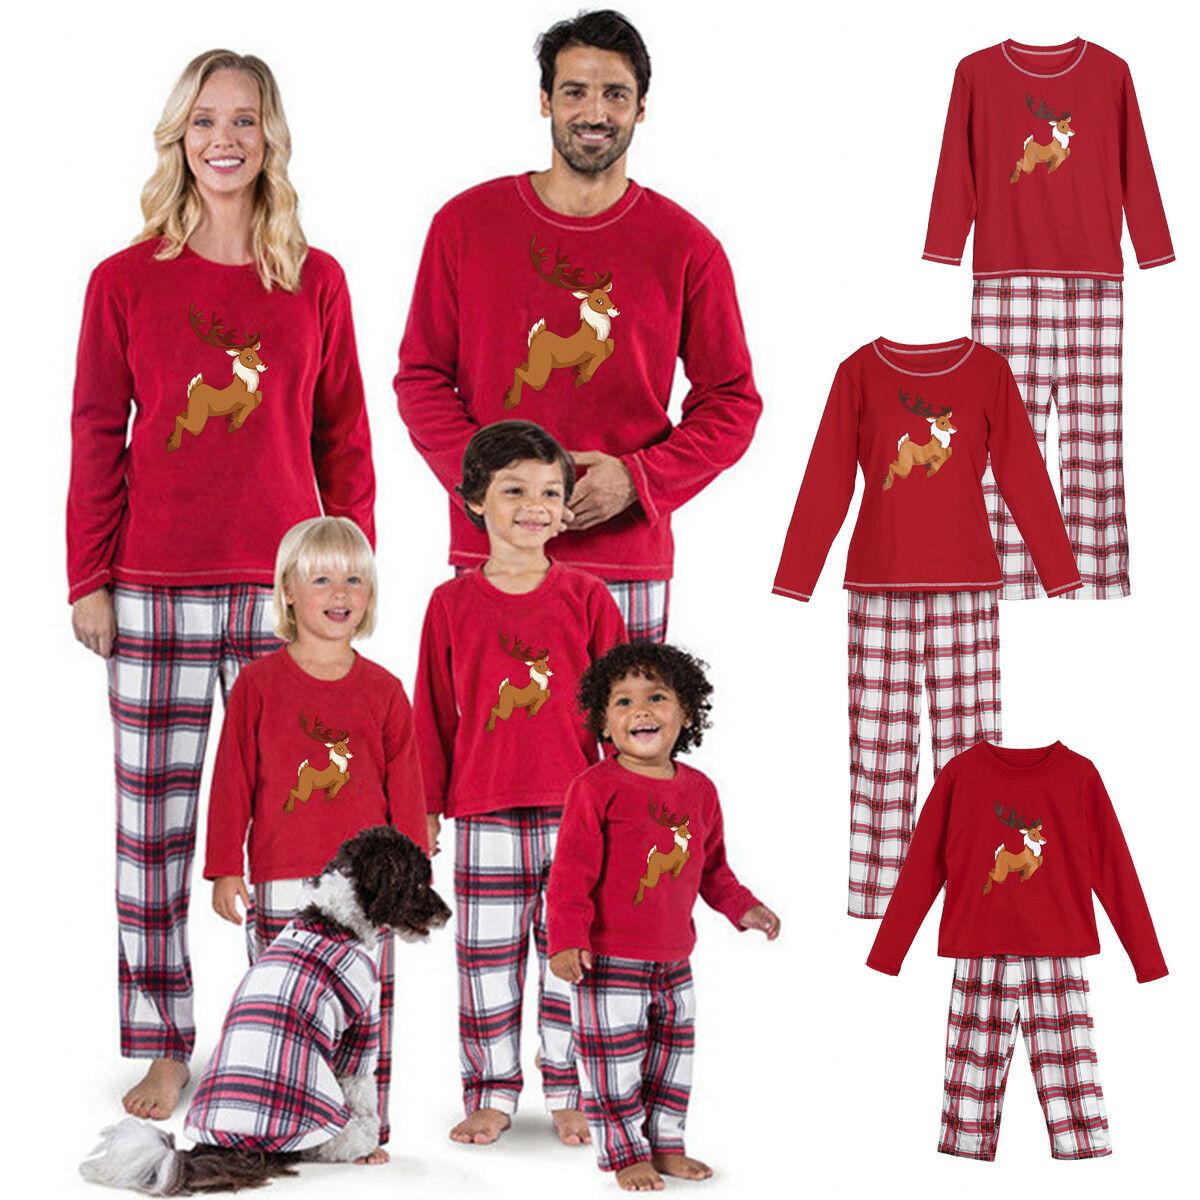 Fashion Adult Kids Baby Family Matcing Christmas Pajamas Set Sleepwear Xmas Pj's Nightwear Set Family Homewear Pajama Sets